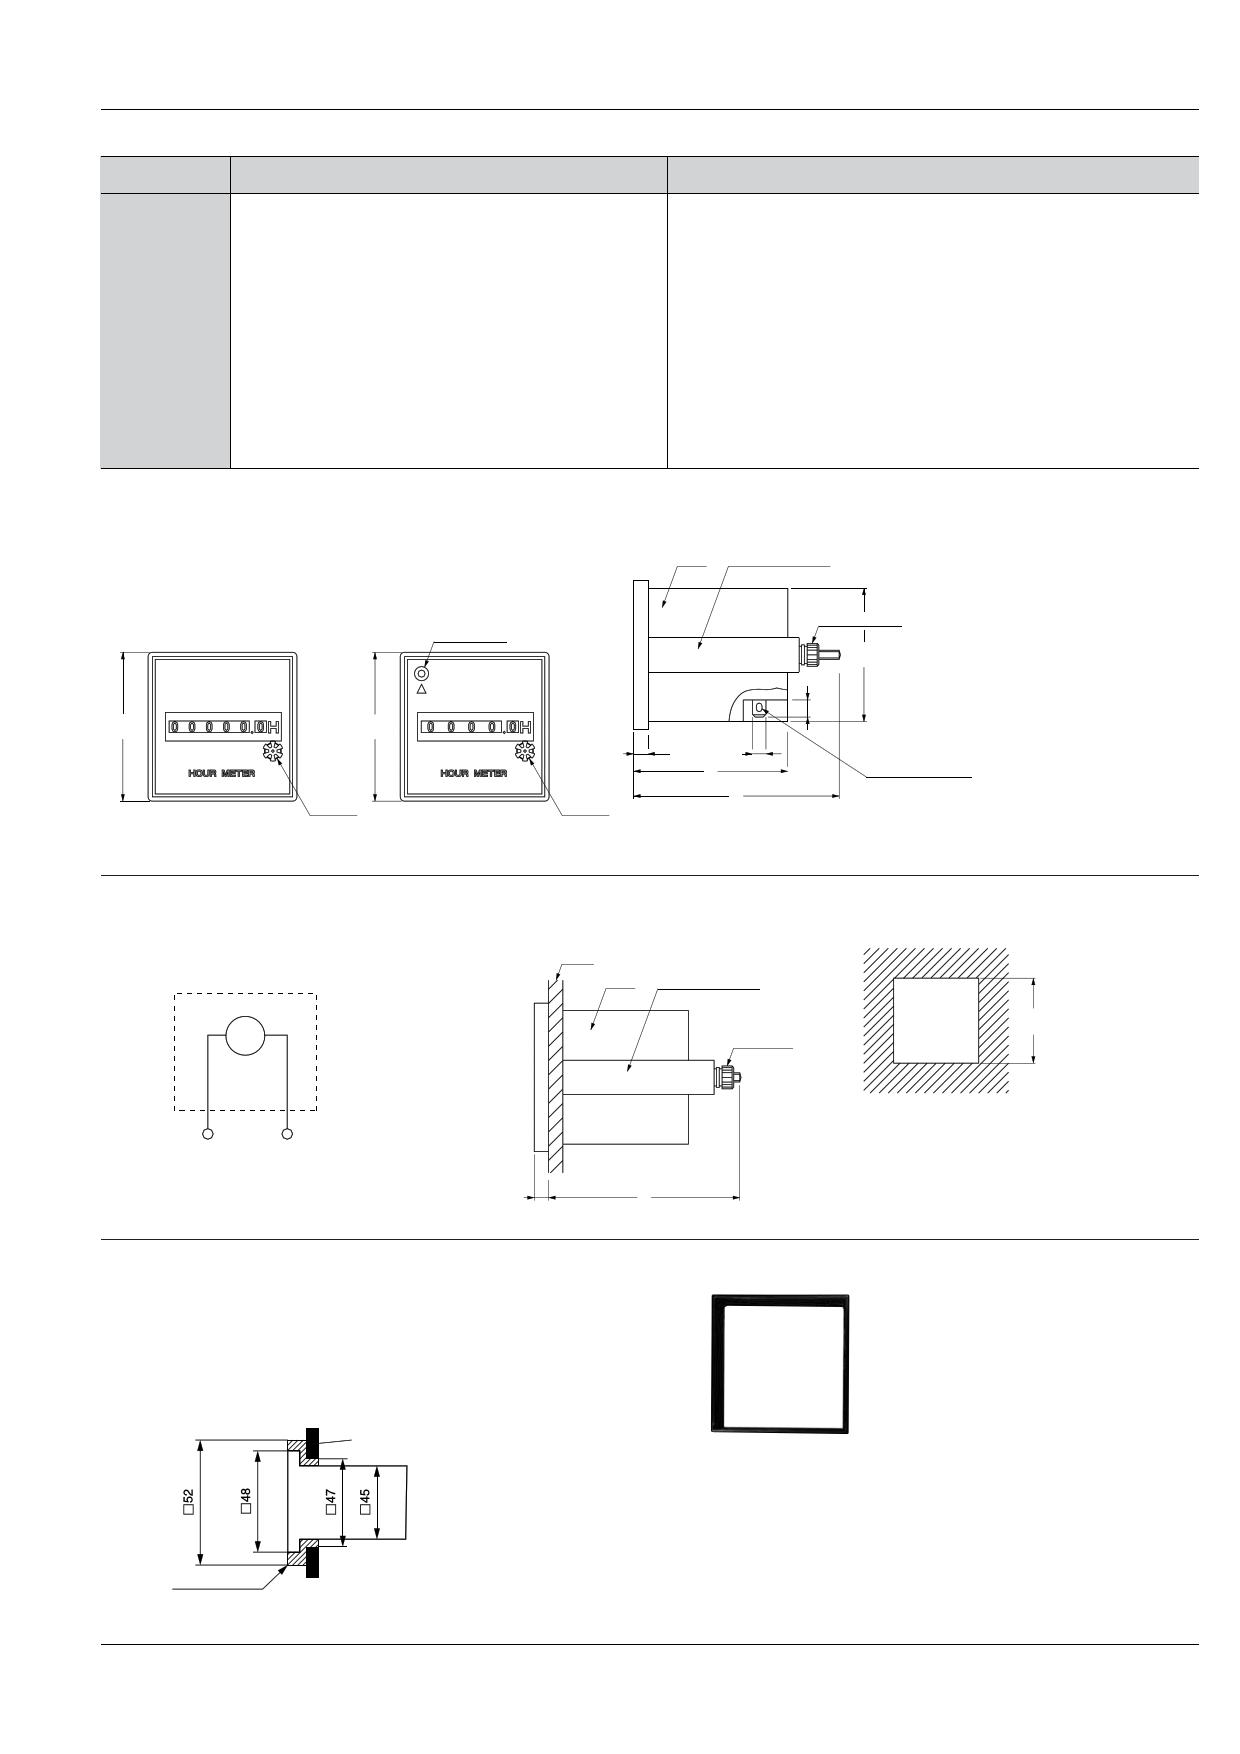 th1386 datasheet pdf   pinout